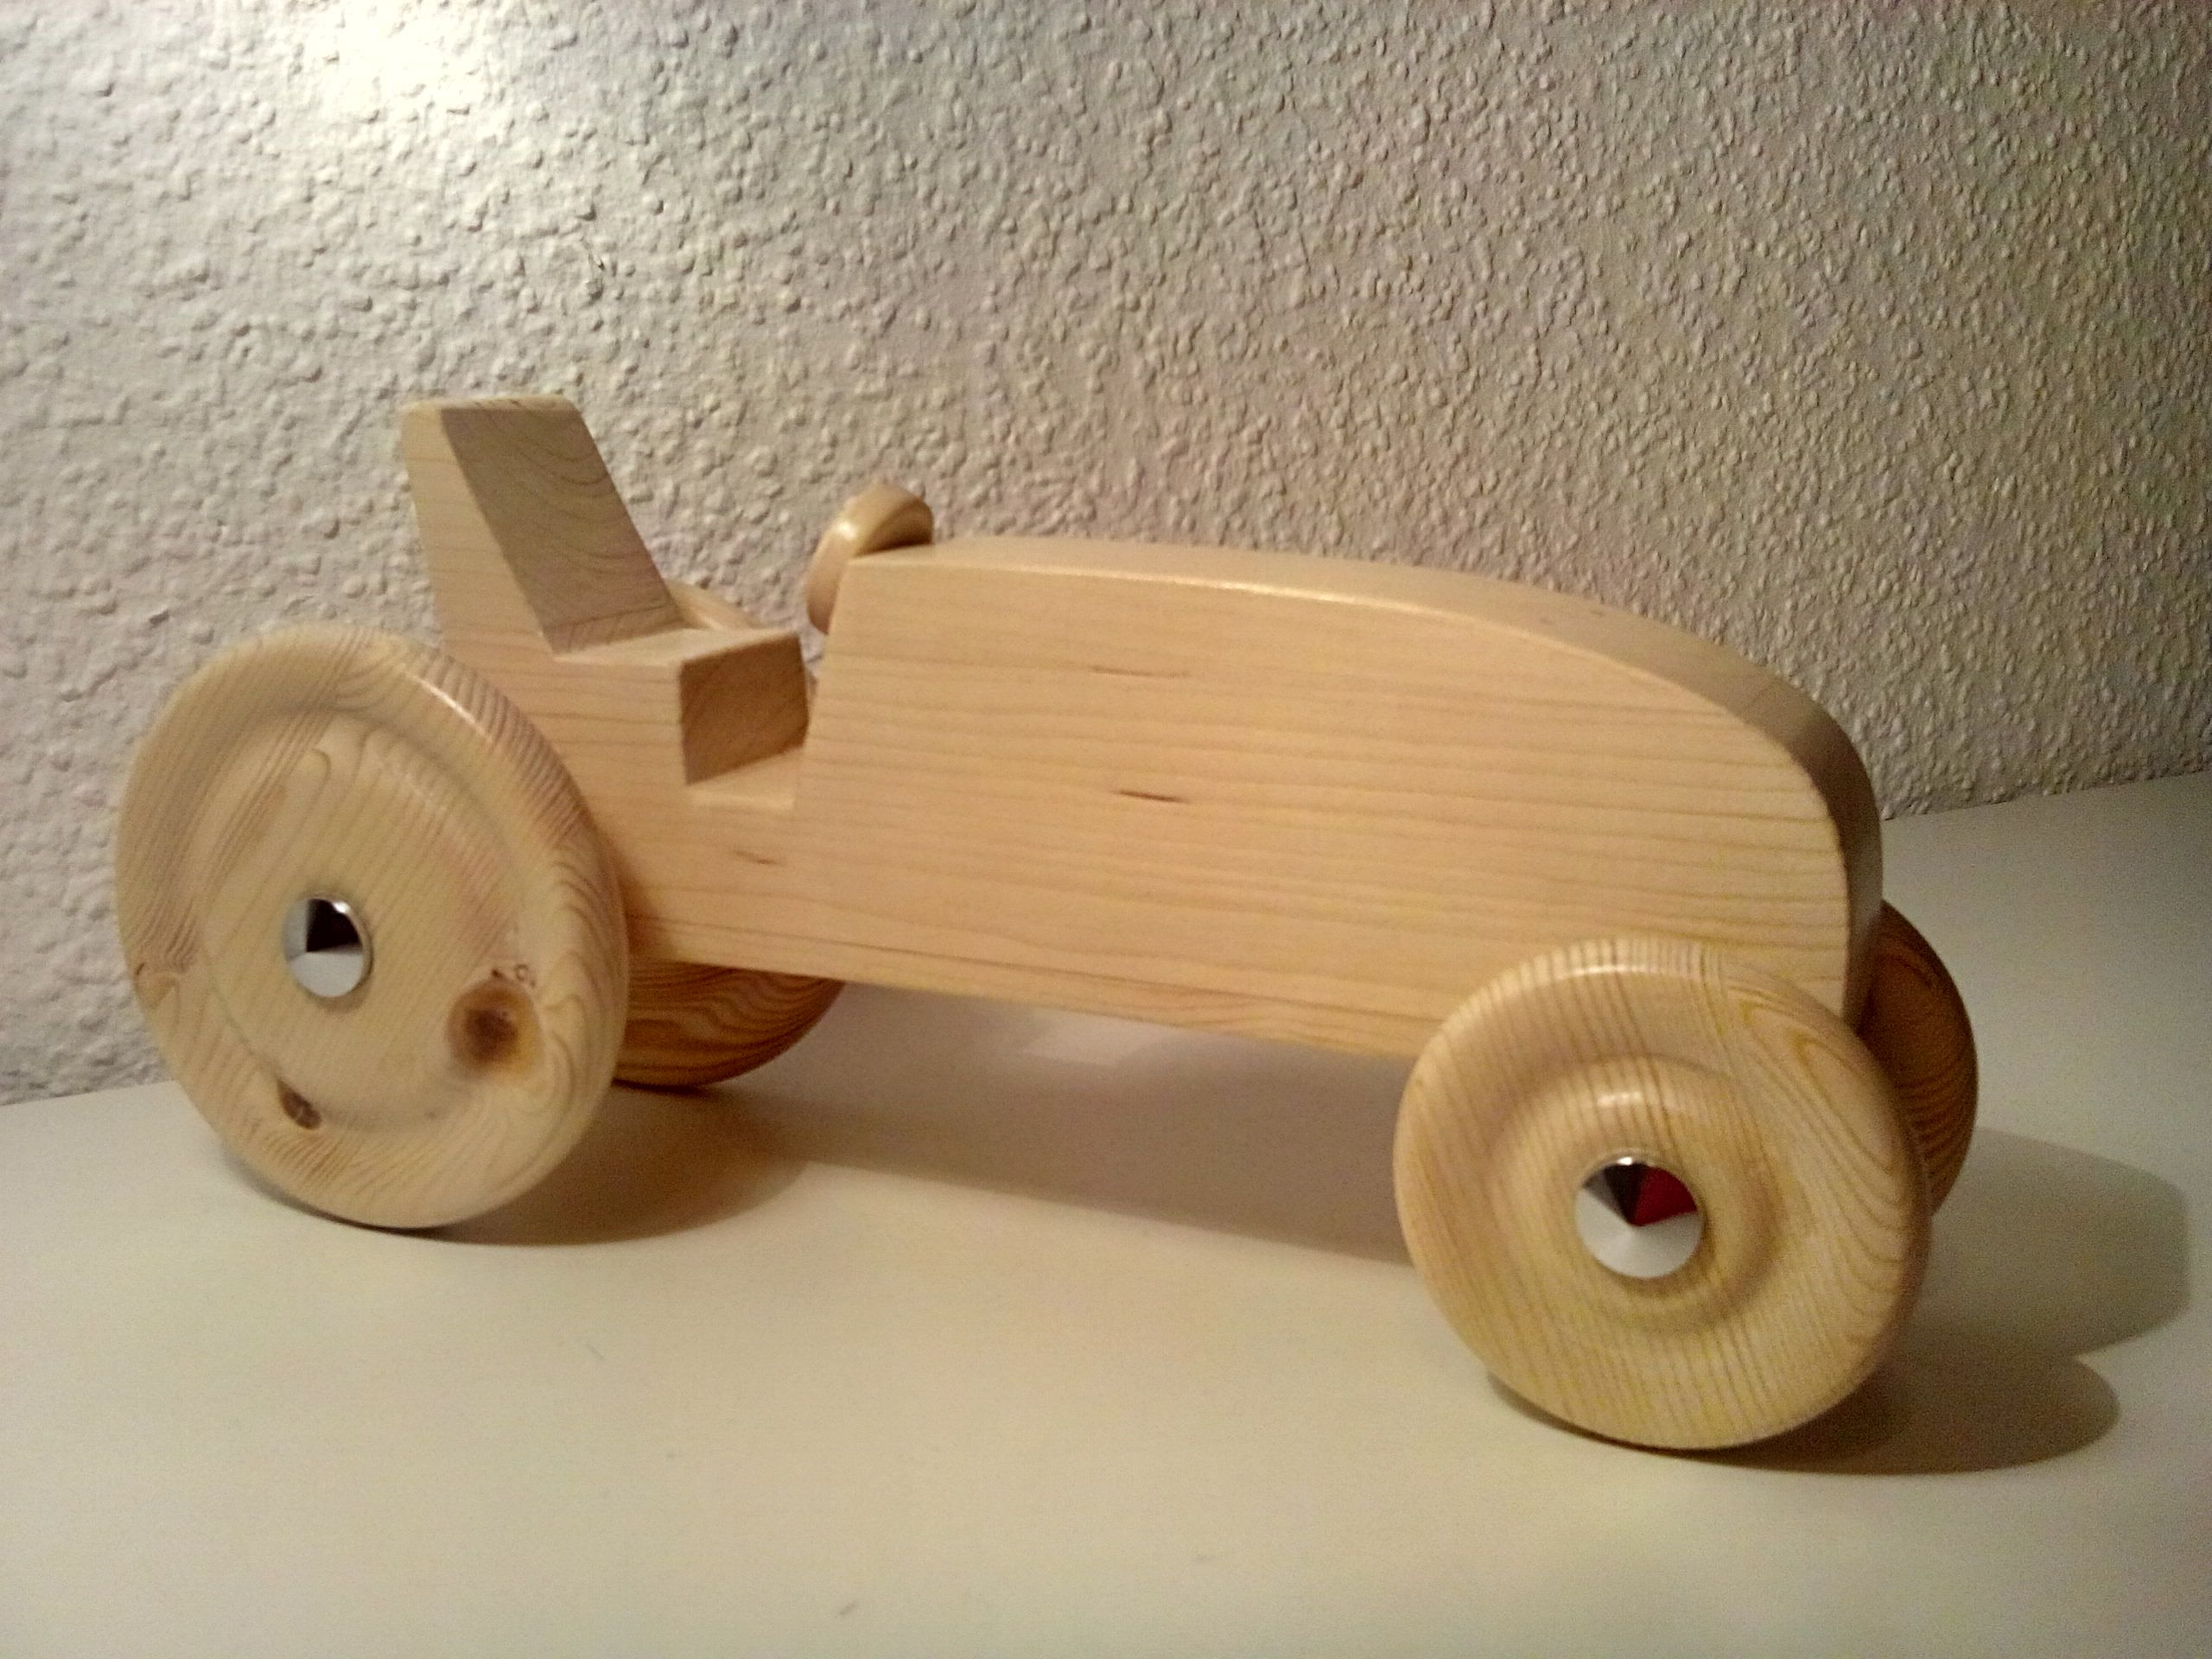 mein erster traktor aus holz bauanleitung zum selber bauen holzspielwaren pinterest banks. Black Bedroom Furniture Sets. Home Design Ideas